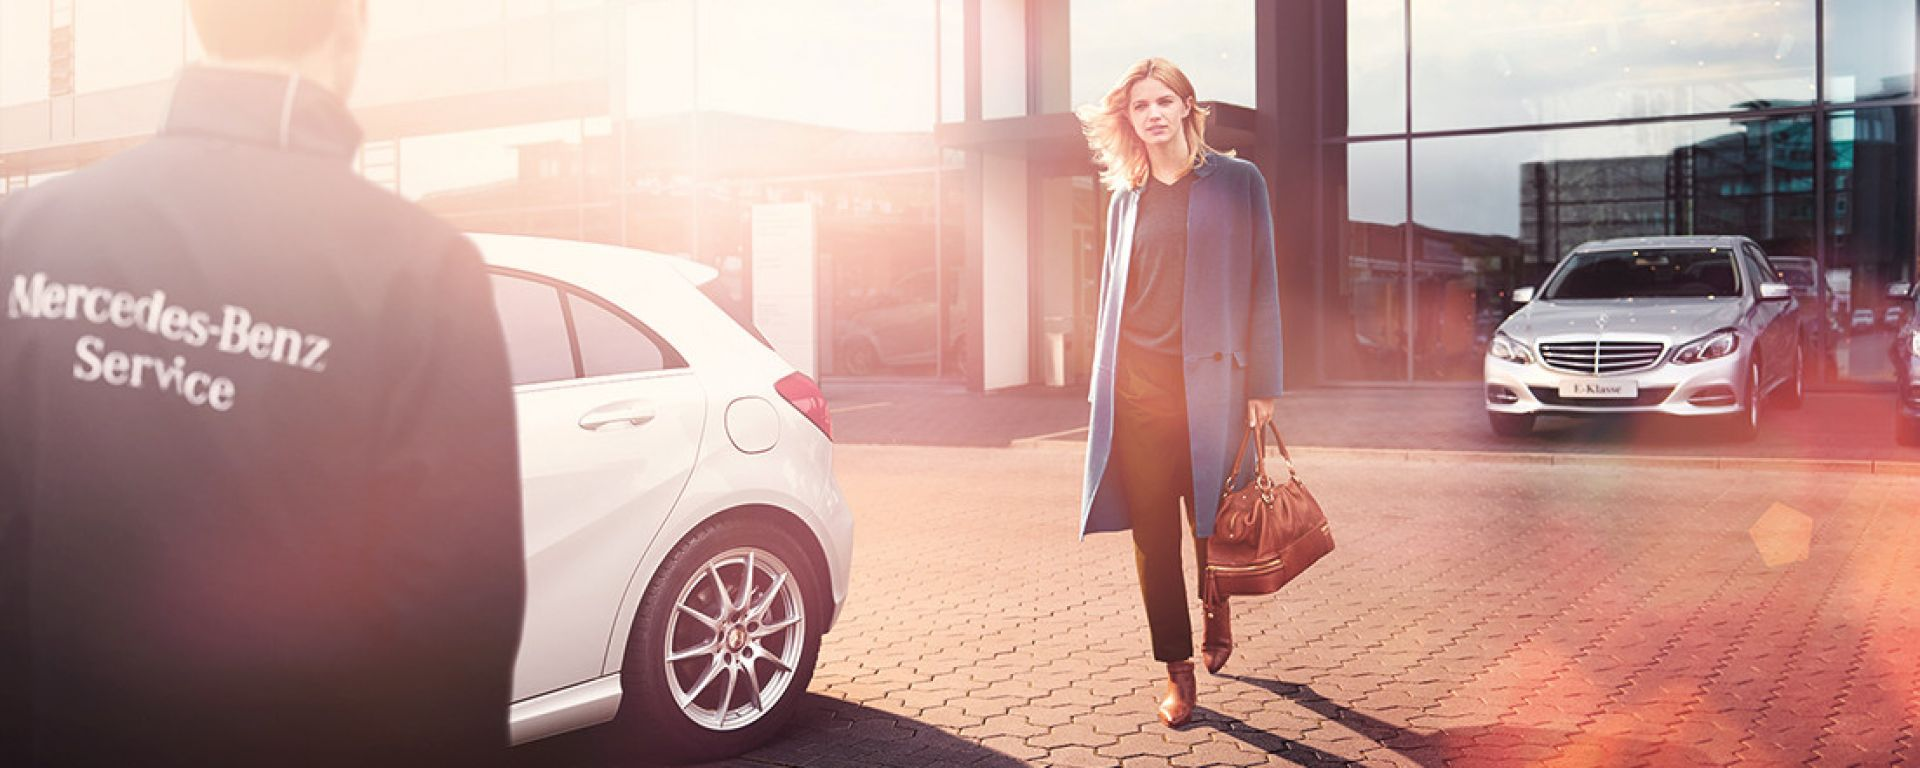 Svolta digitale per i servizi di assistenza cliente di Mercedes-Benz